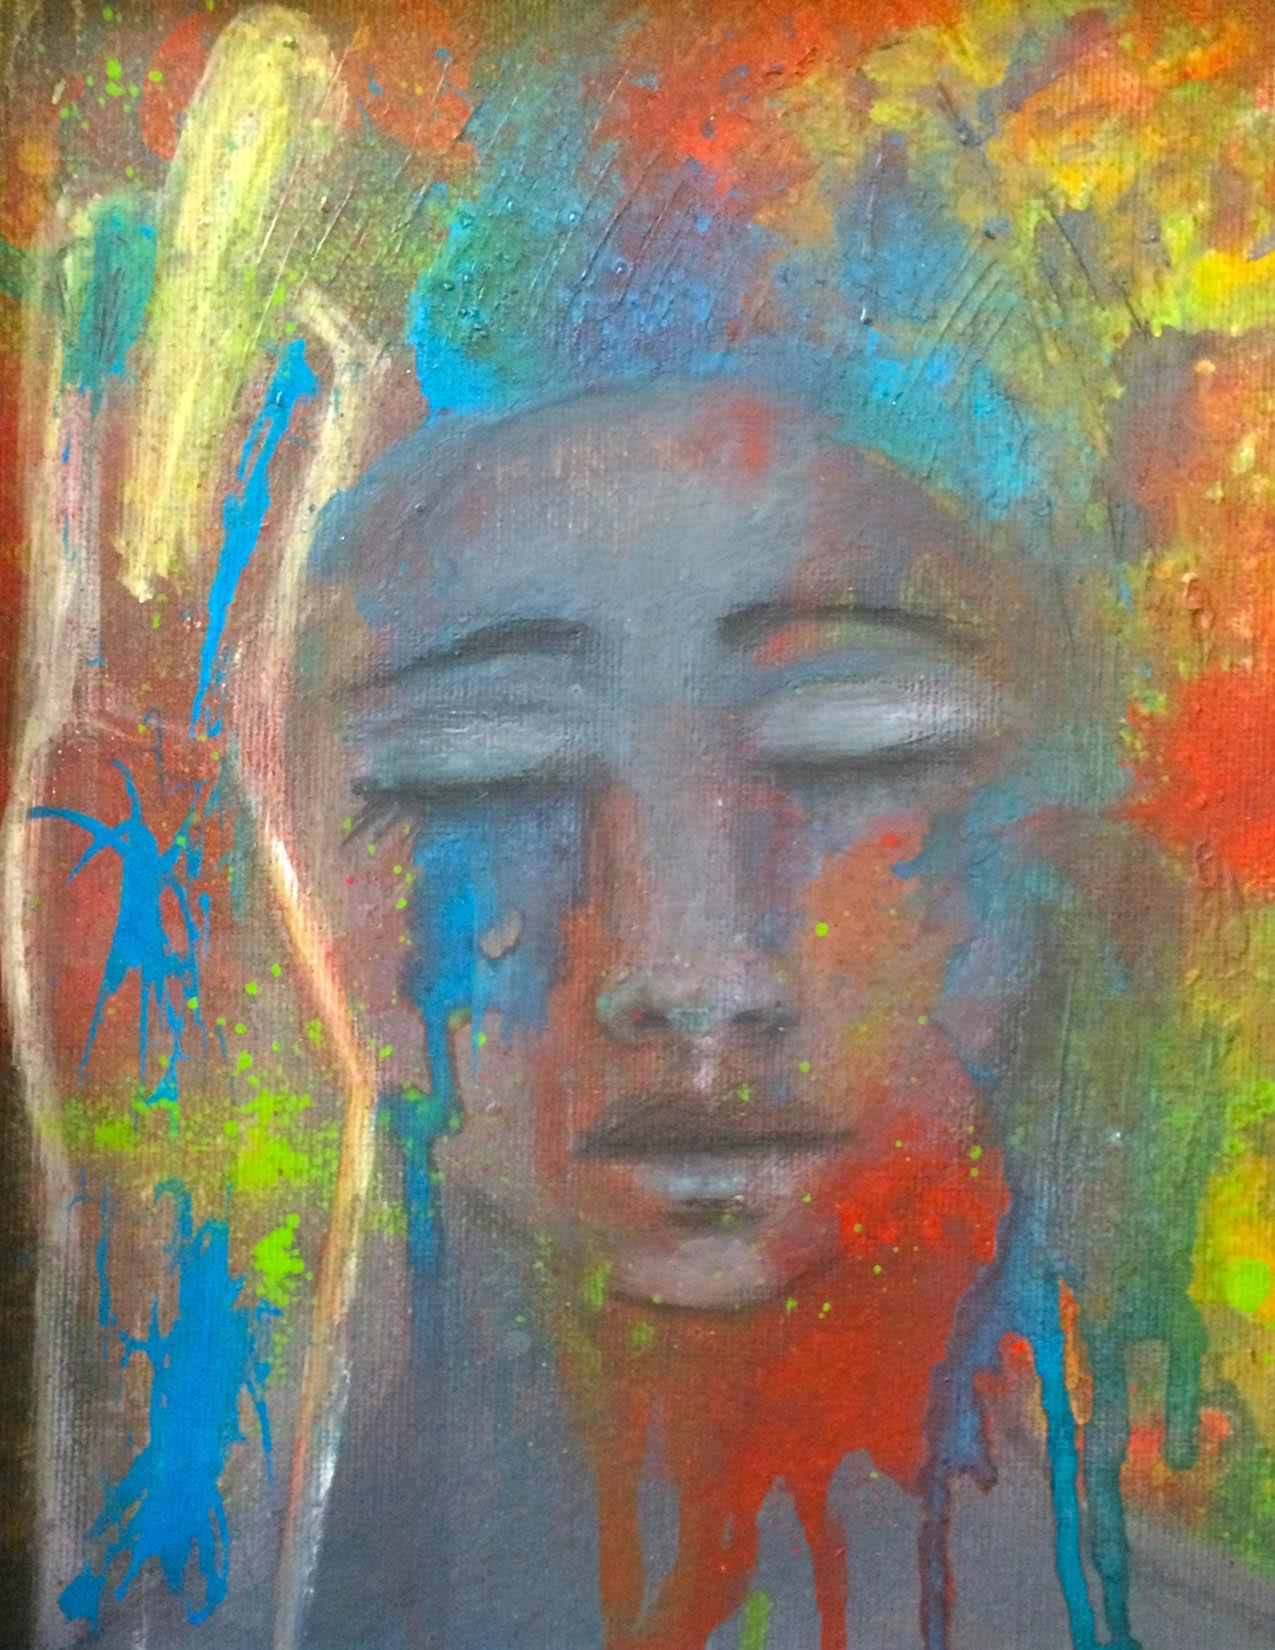 """Emerging from the Dark,"" by Stephanie Gagos"